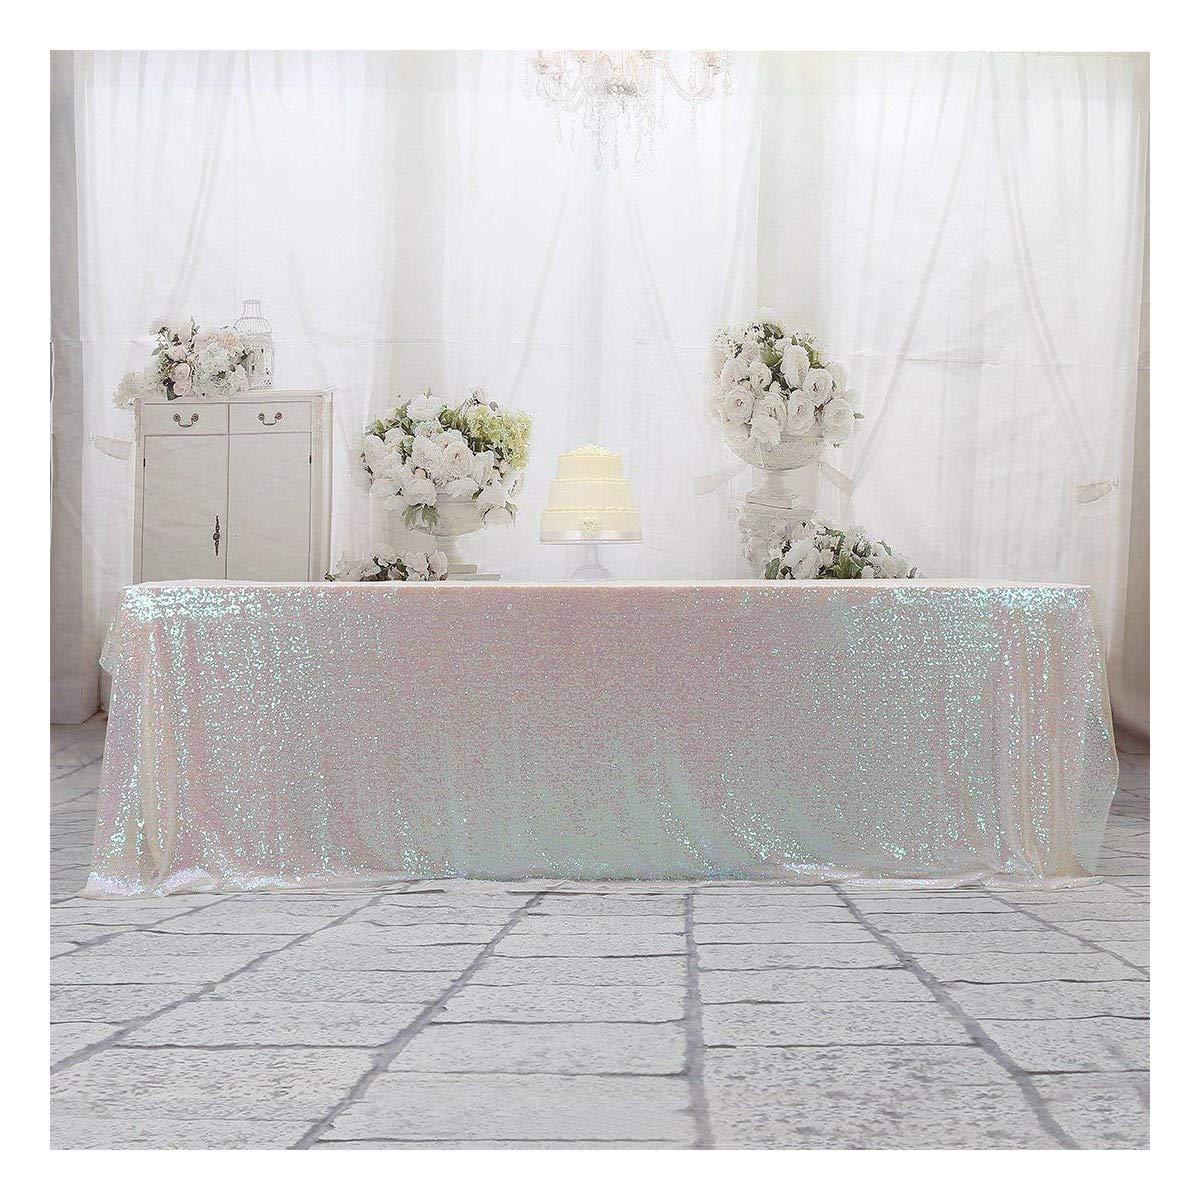 3e Home 60x120 Rectangle Sequin Tablecloth for Wedding Party Cake Table, Iridescent